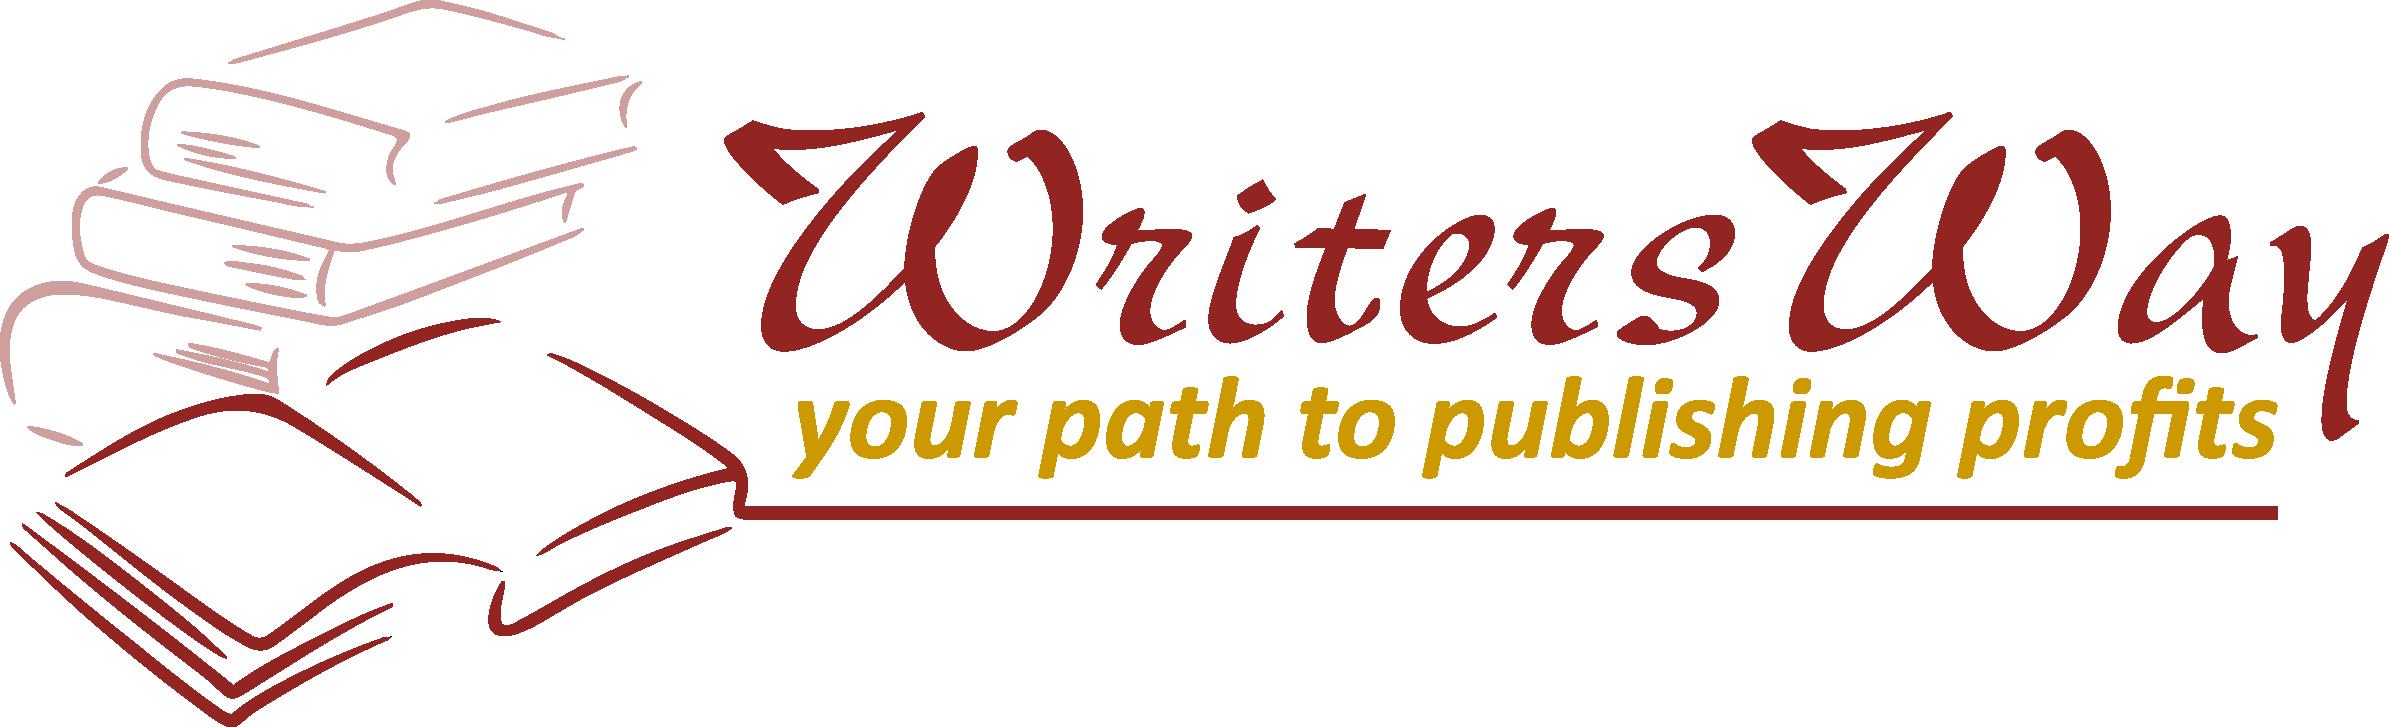 2019 WW logo png